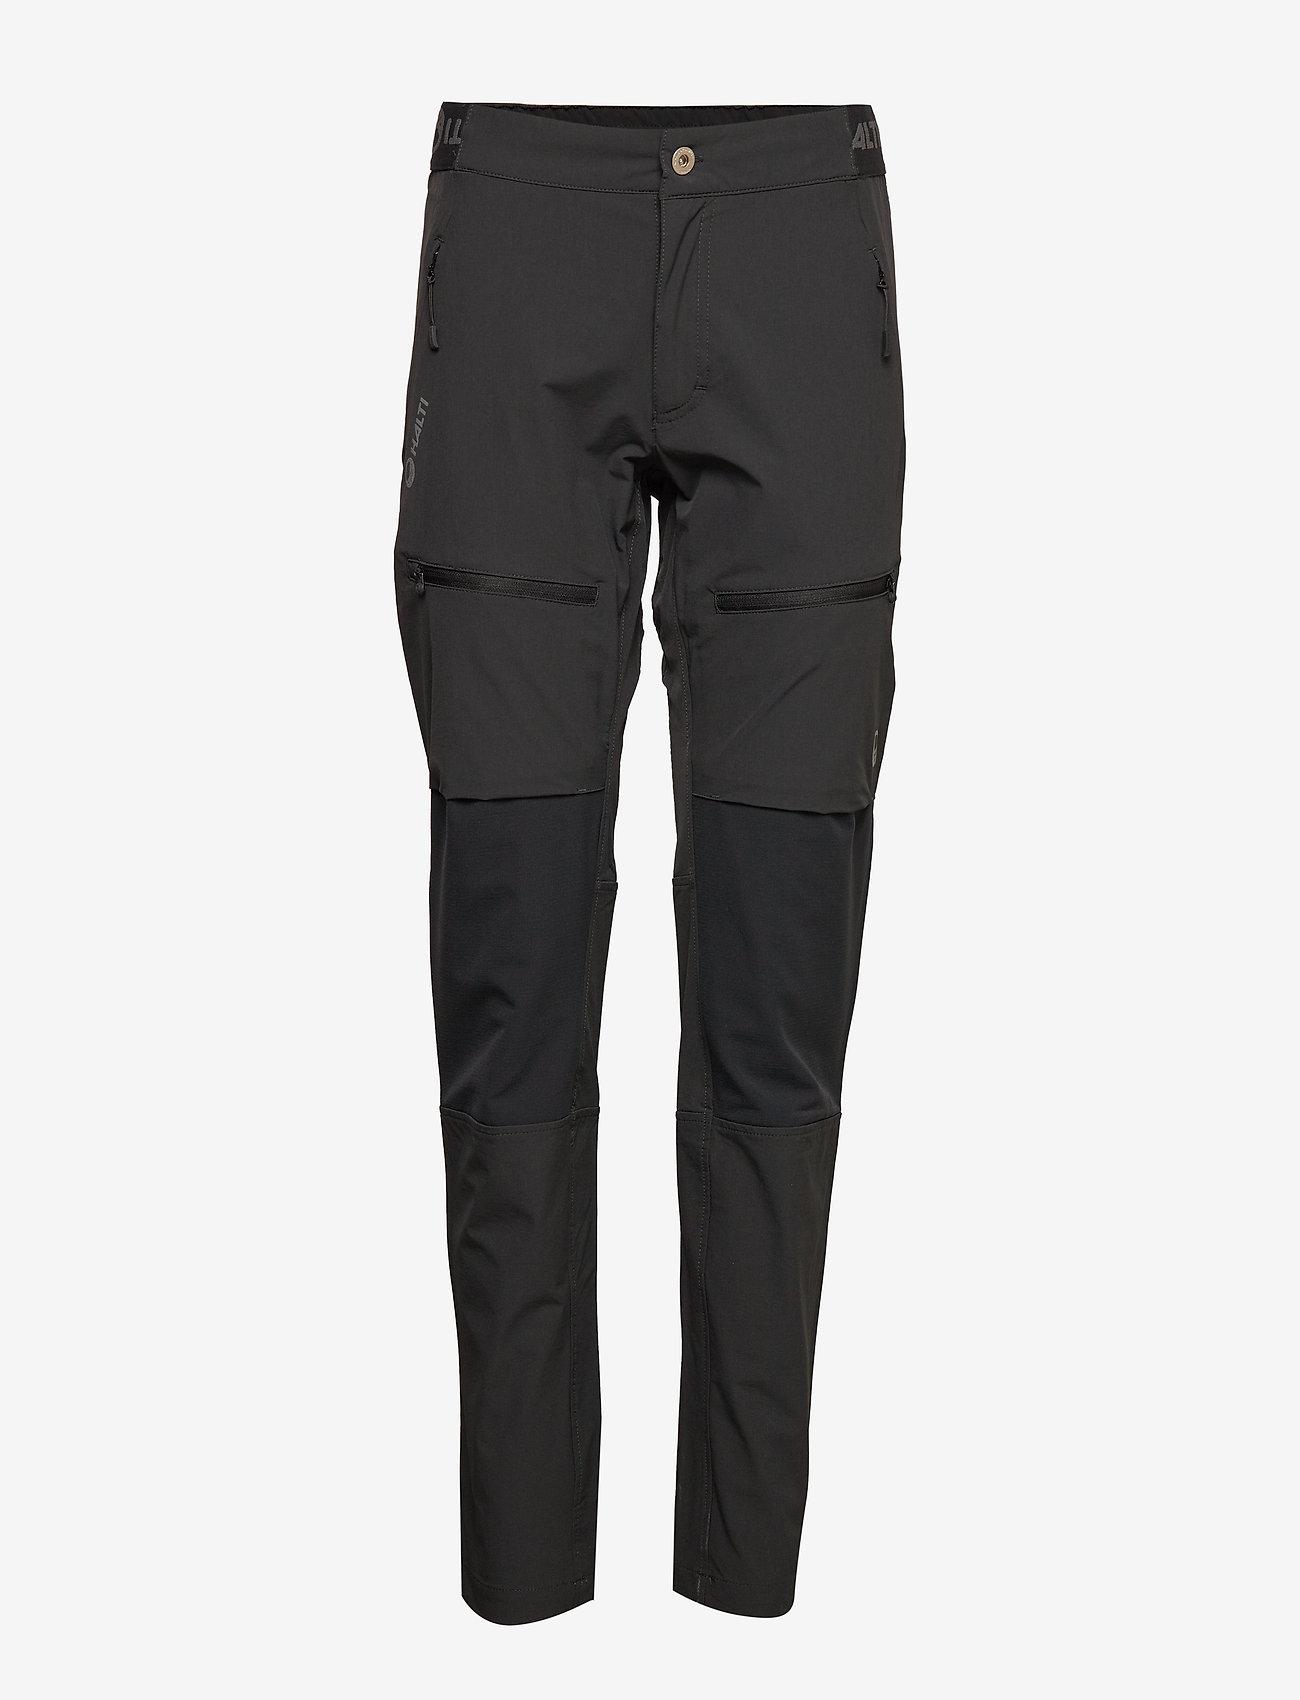 Halti - Pallas Women's X-stretch pants - softshell pants - anthracite grey - 0